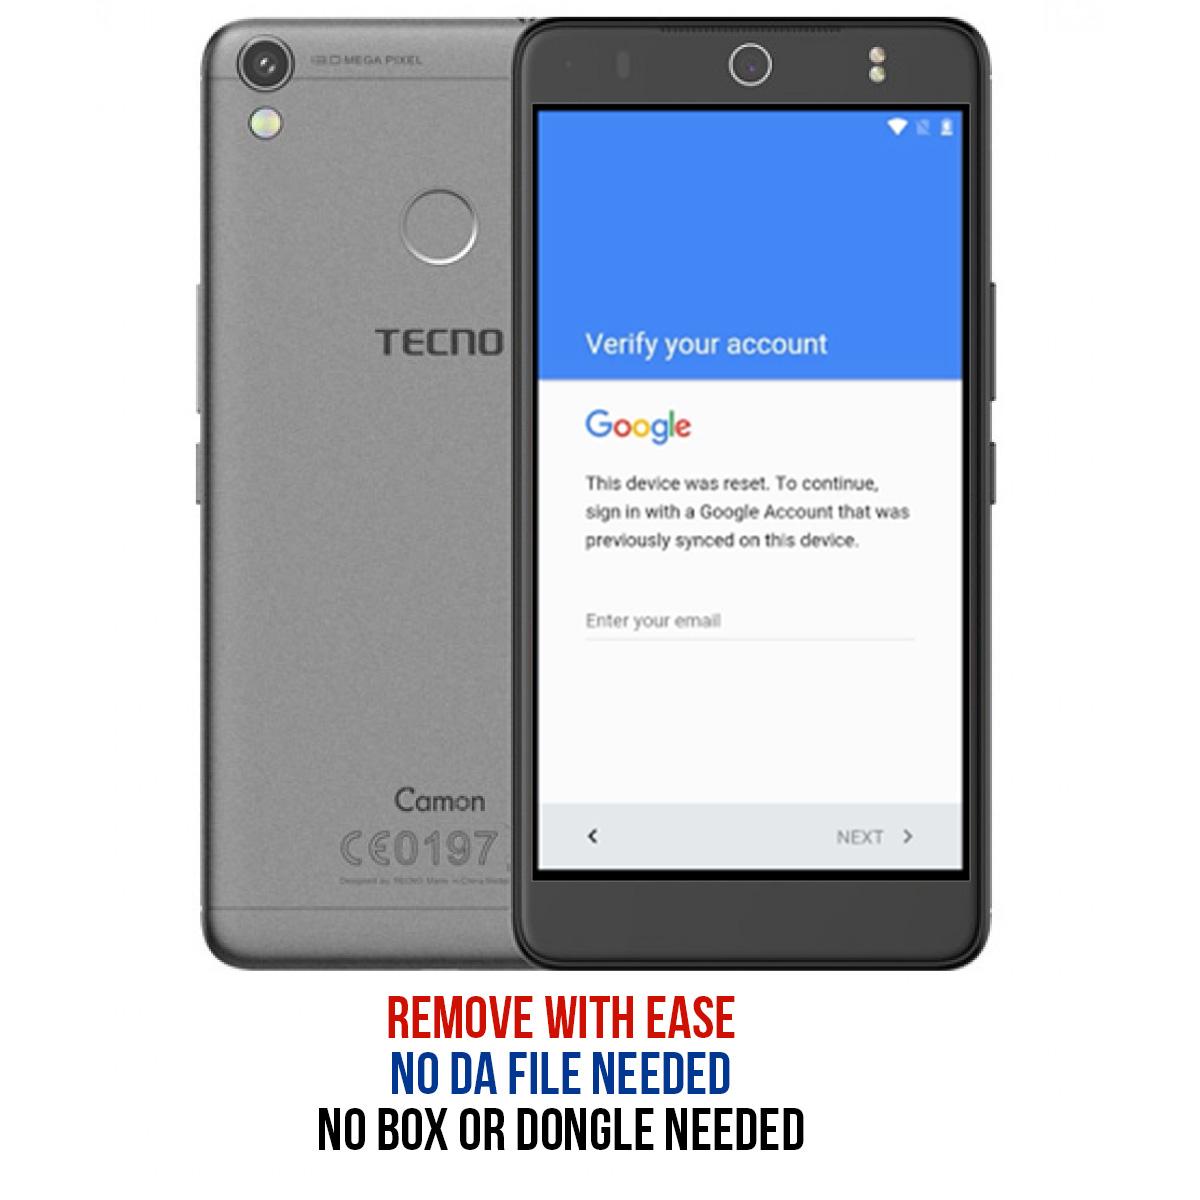 RomKingz: Easiest way to remove frp (Google Account lock) on Tecno